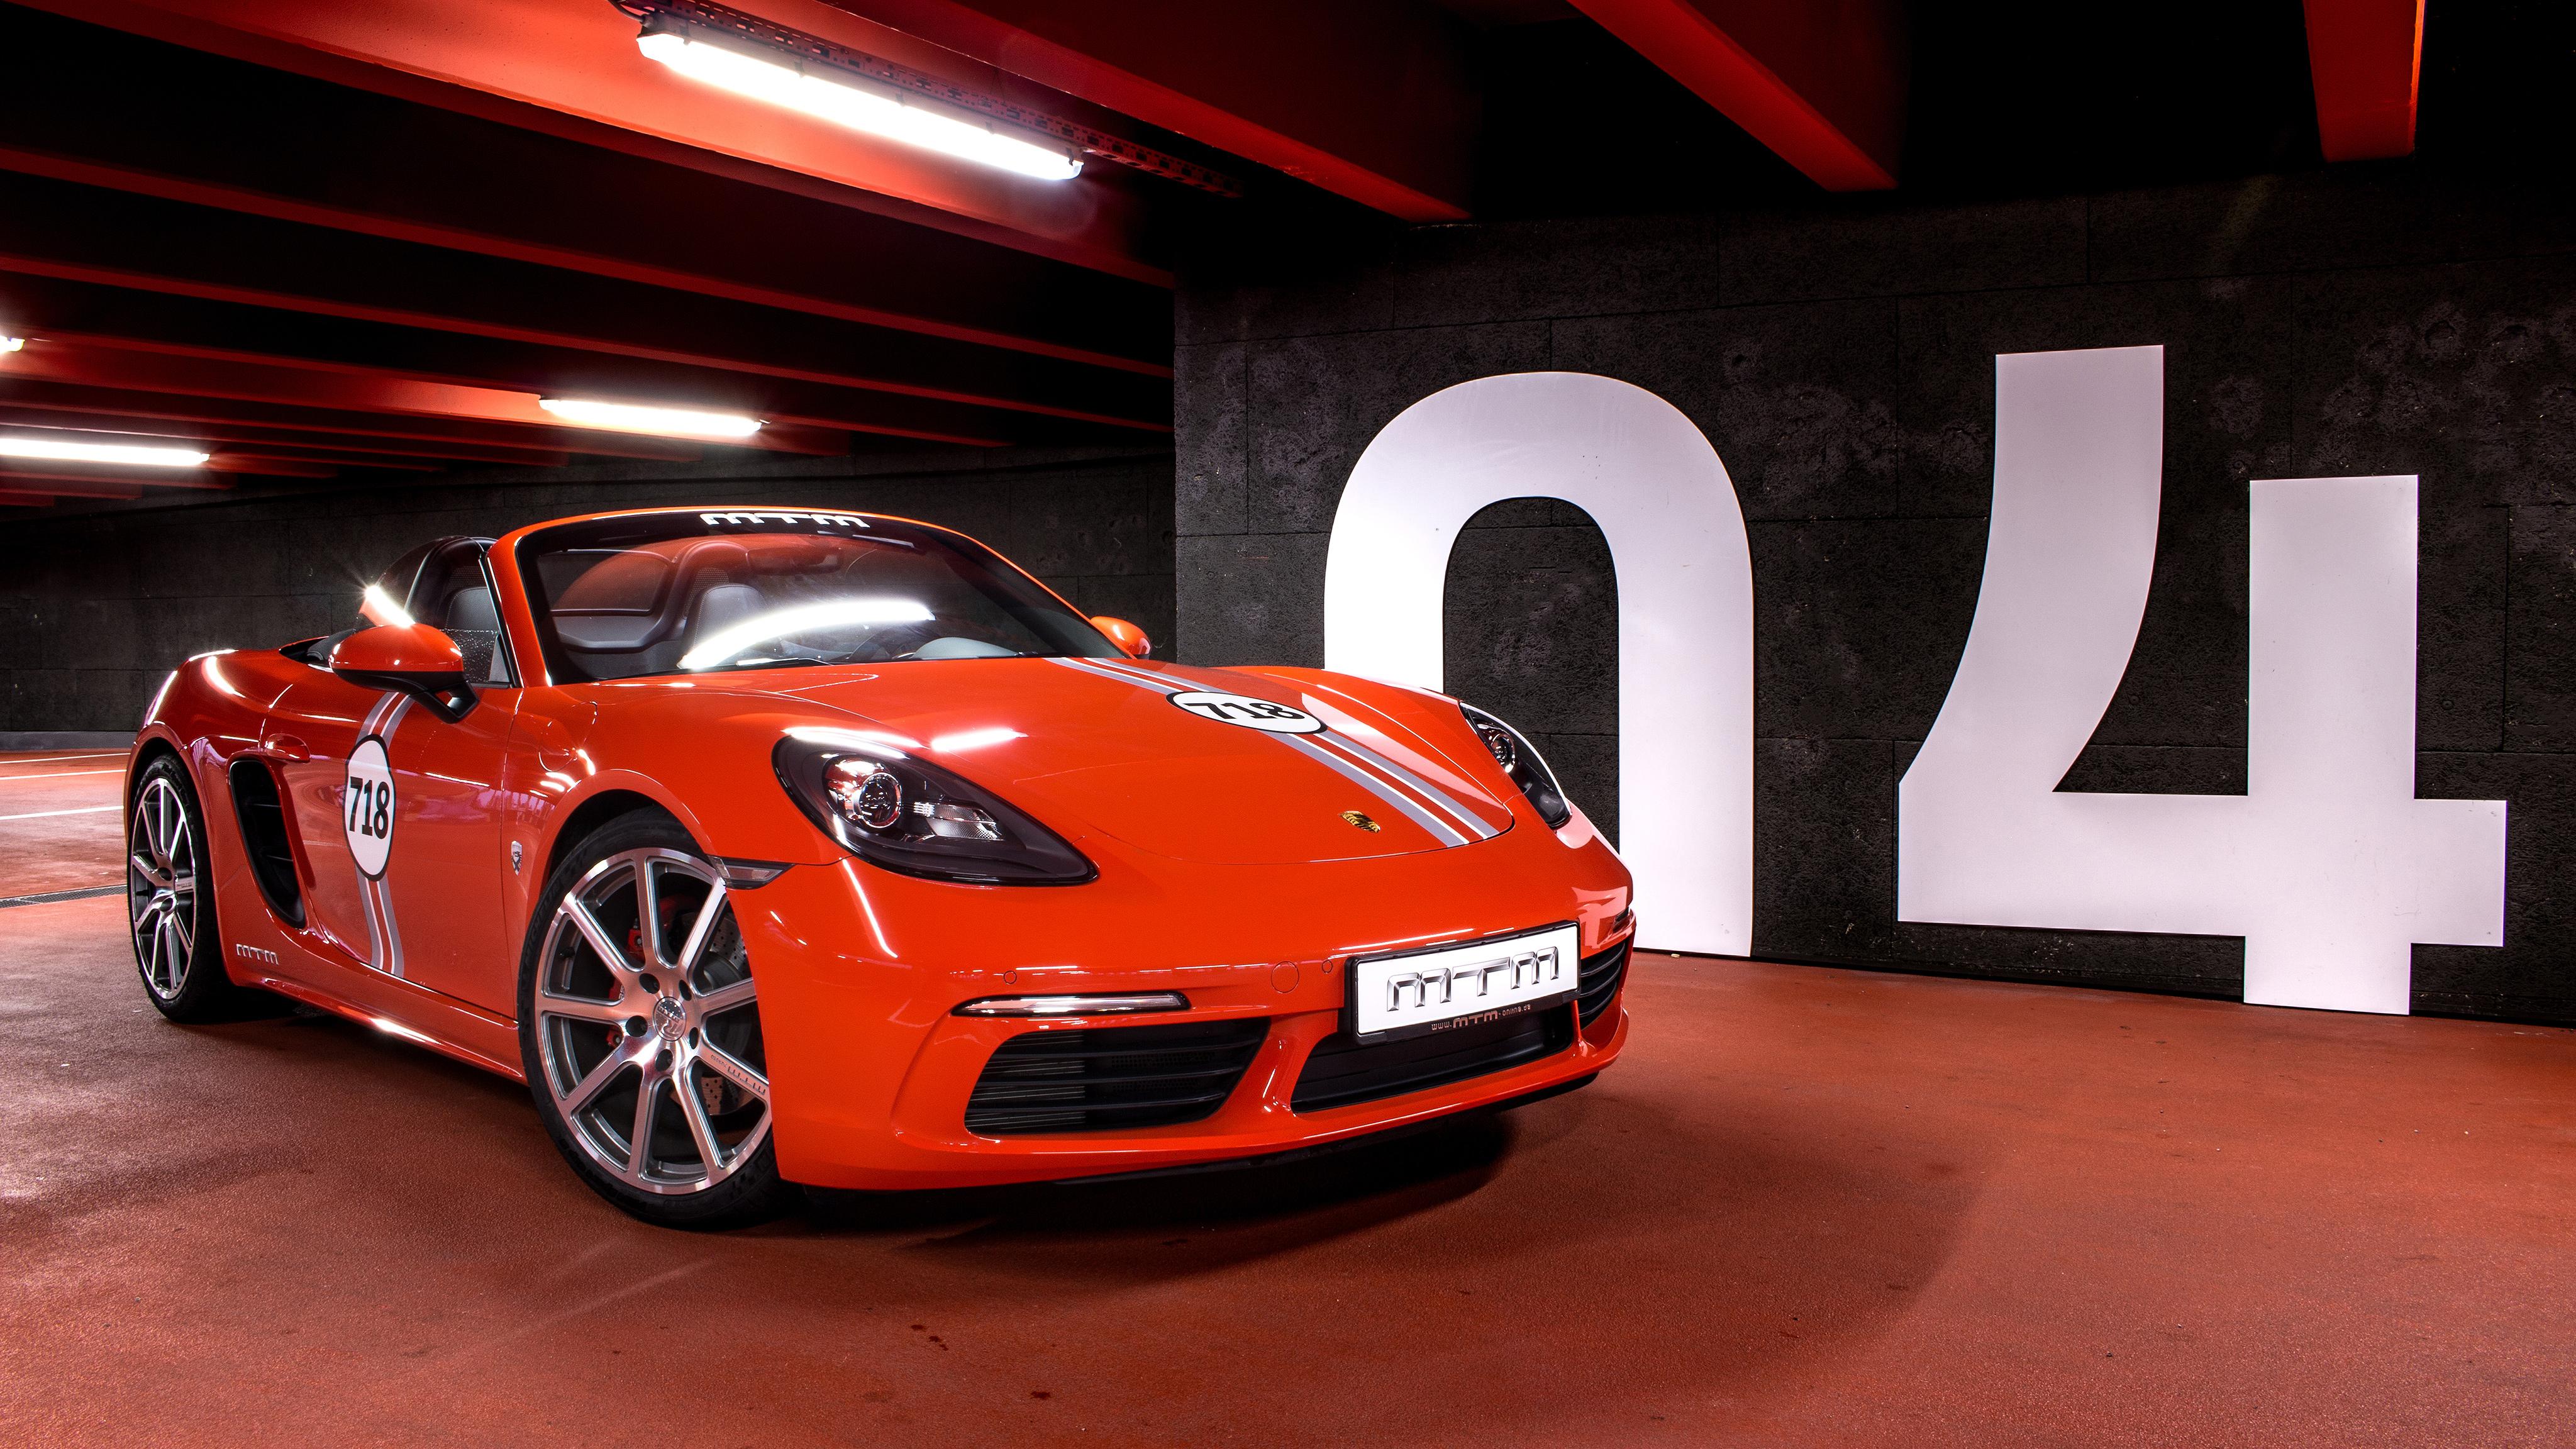 2017 mtm porsche 718 boxster - Porsche Wallpapers For Desktop